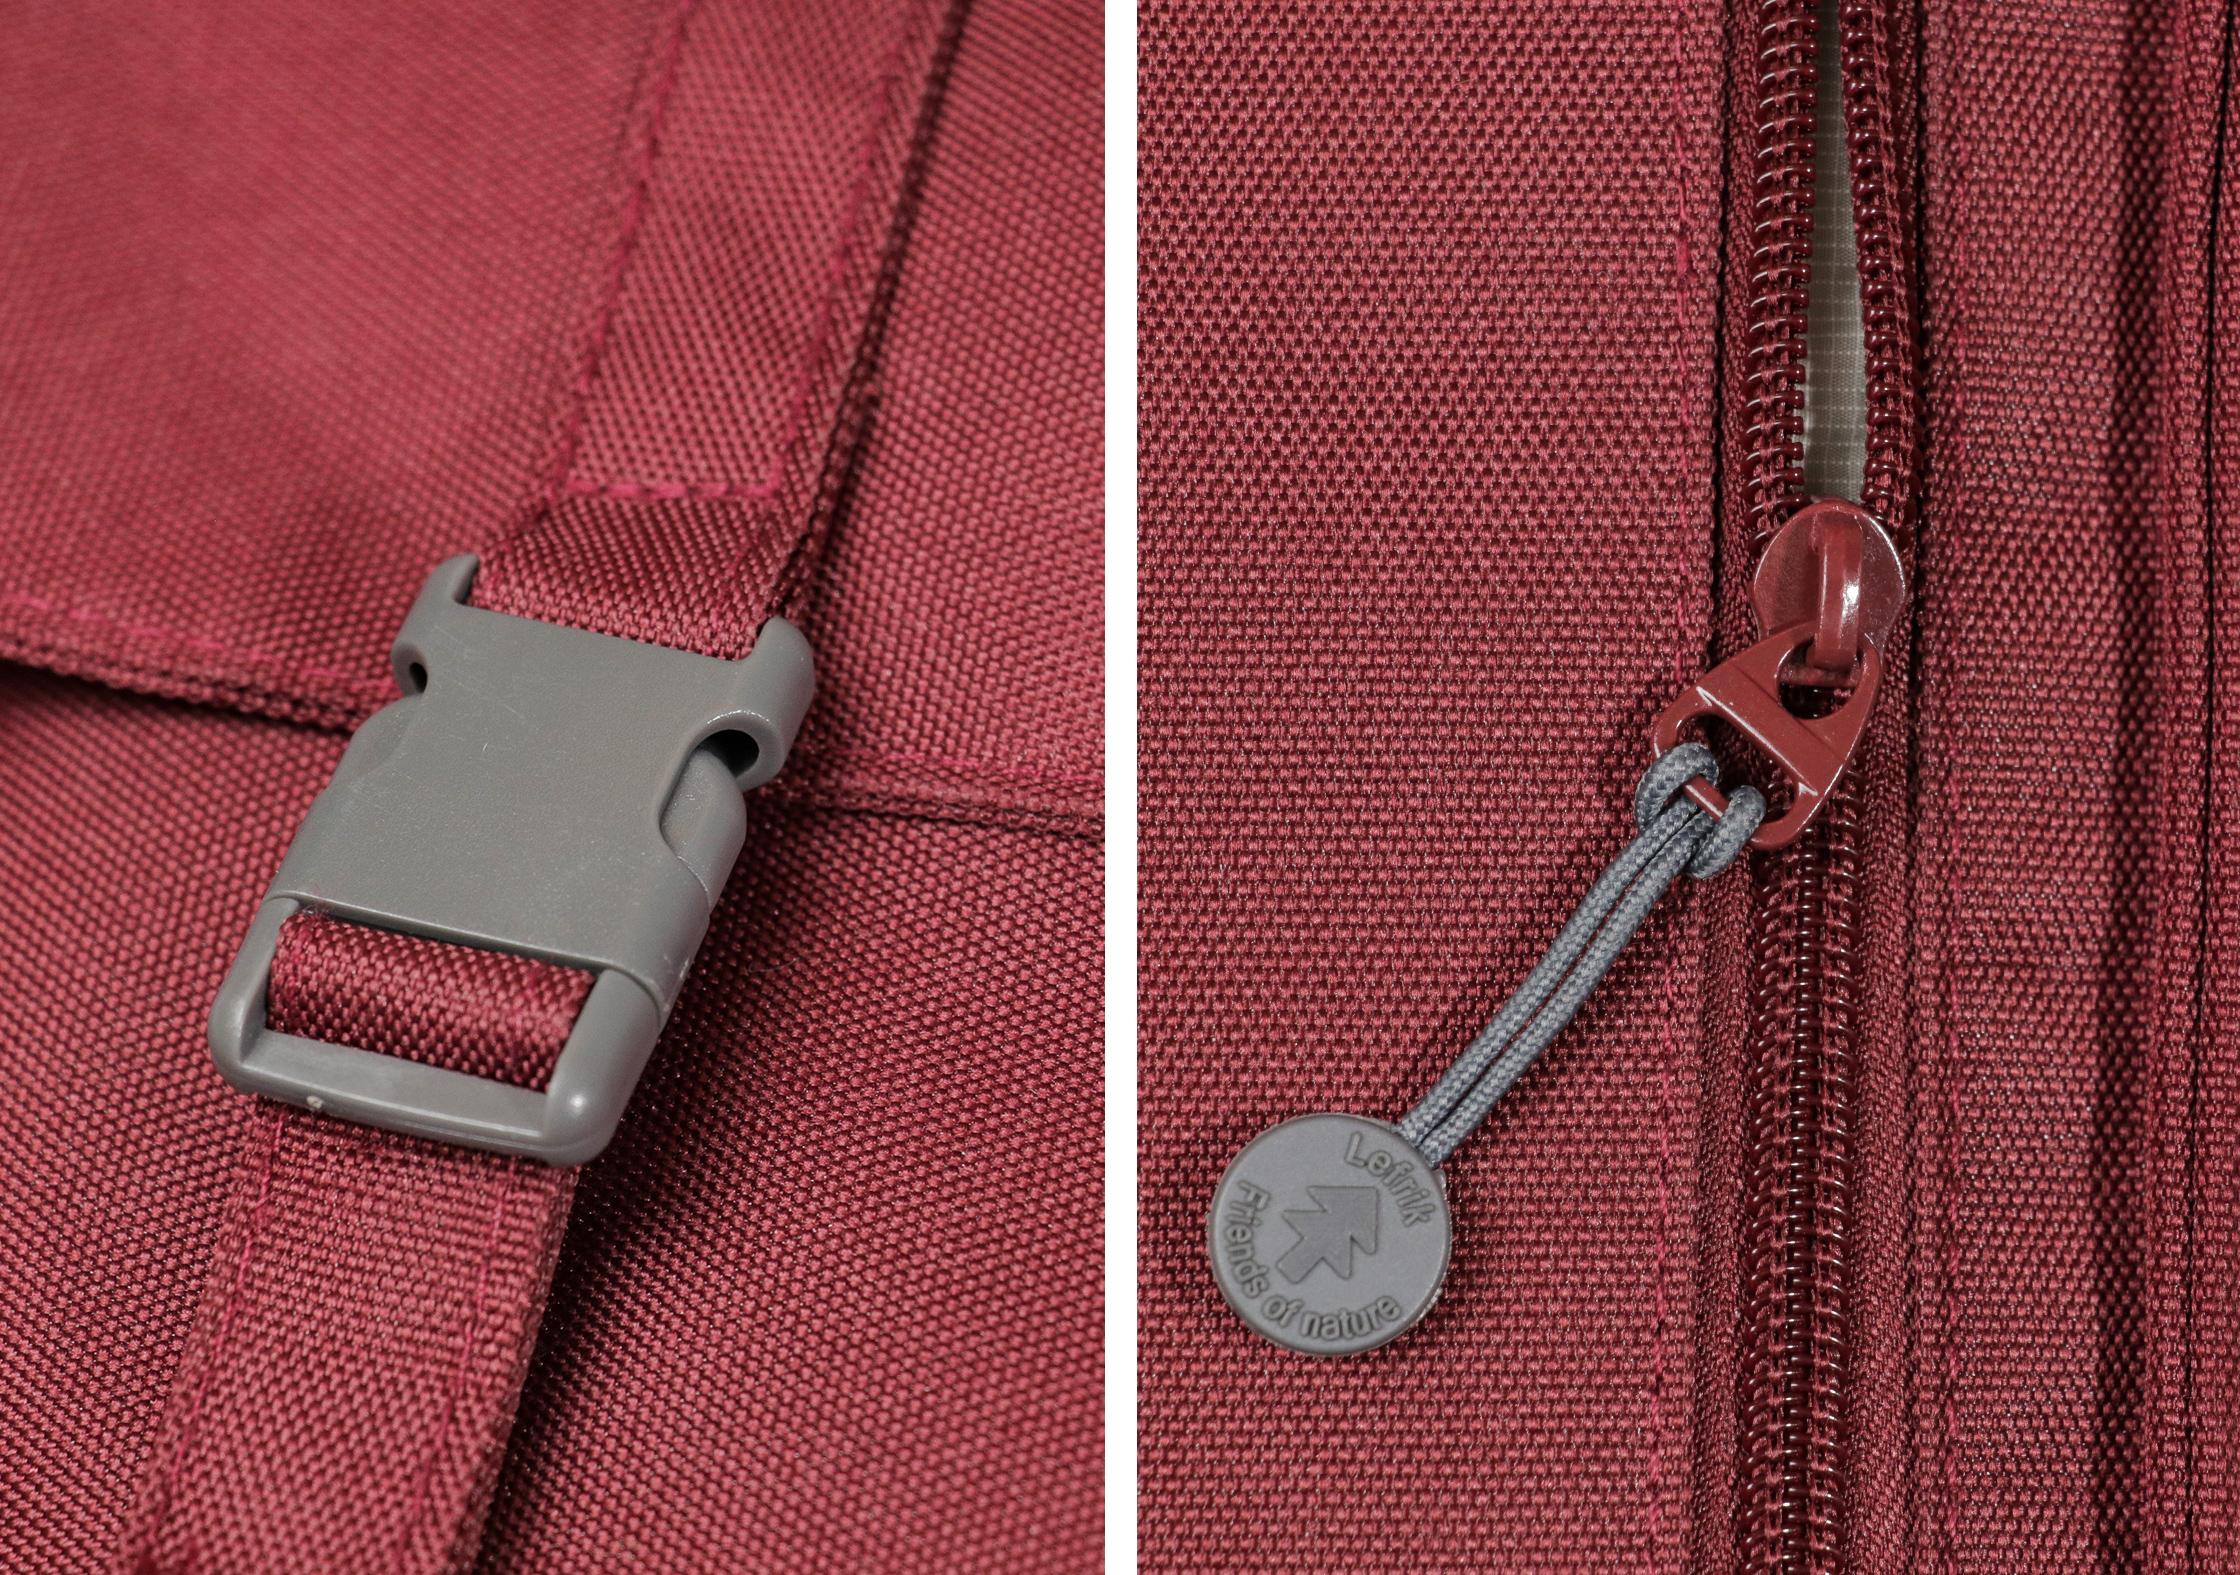 Lefrik Handy Backpack Zippers & Buckles